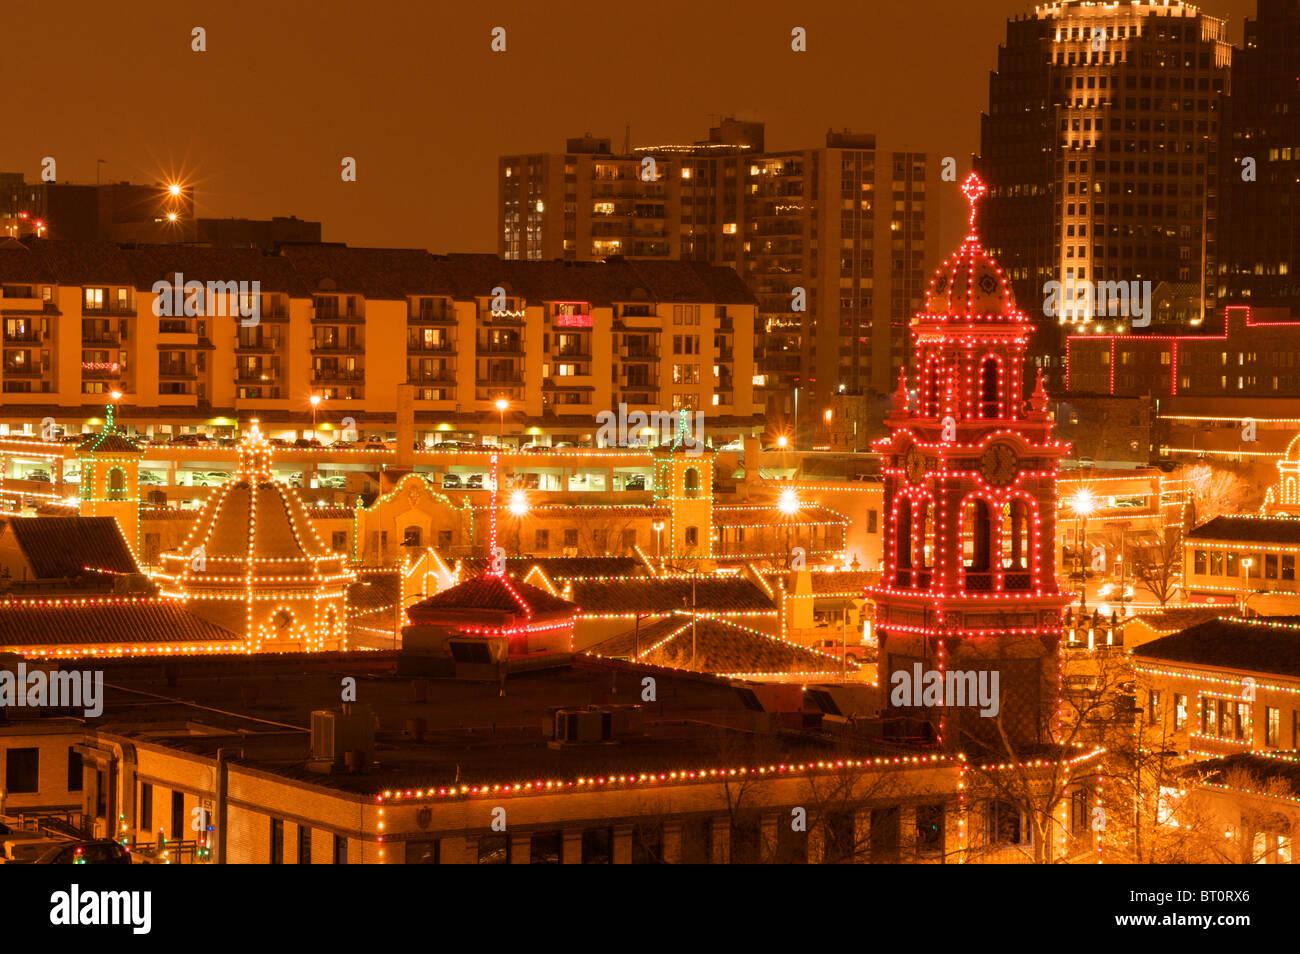 Kansas City Plaza Christmas lights Stock Photo: 31980878 - Alamy